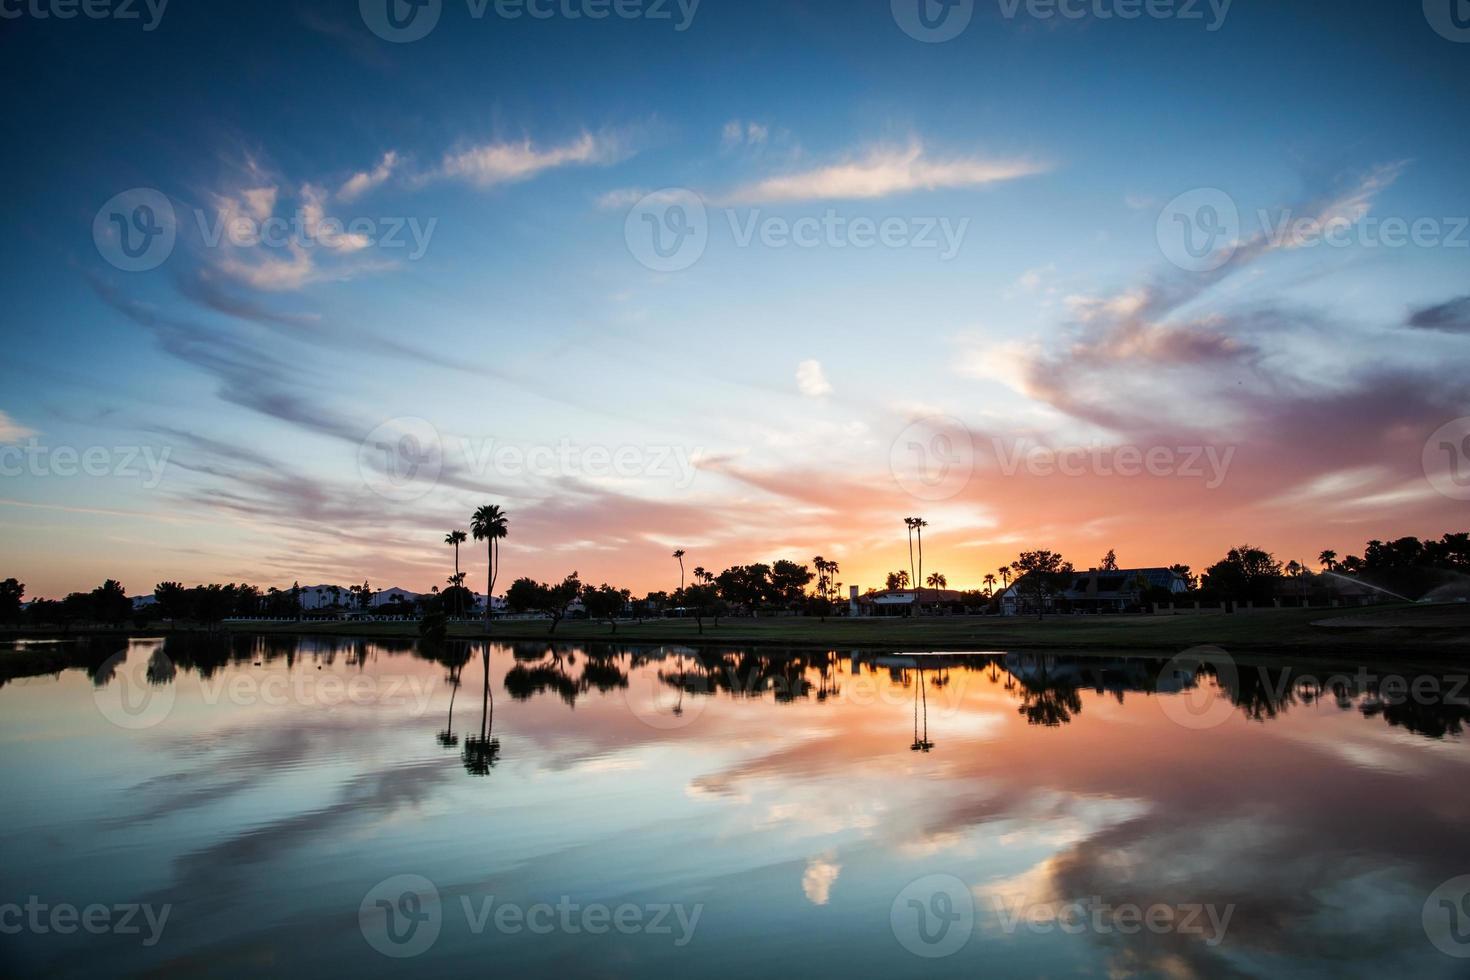 spectaculaire zonsondergang foto